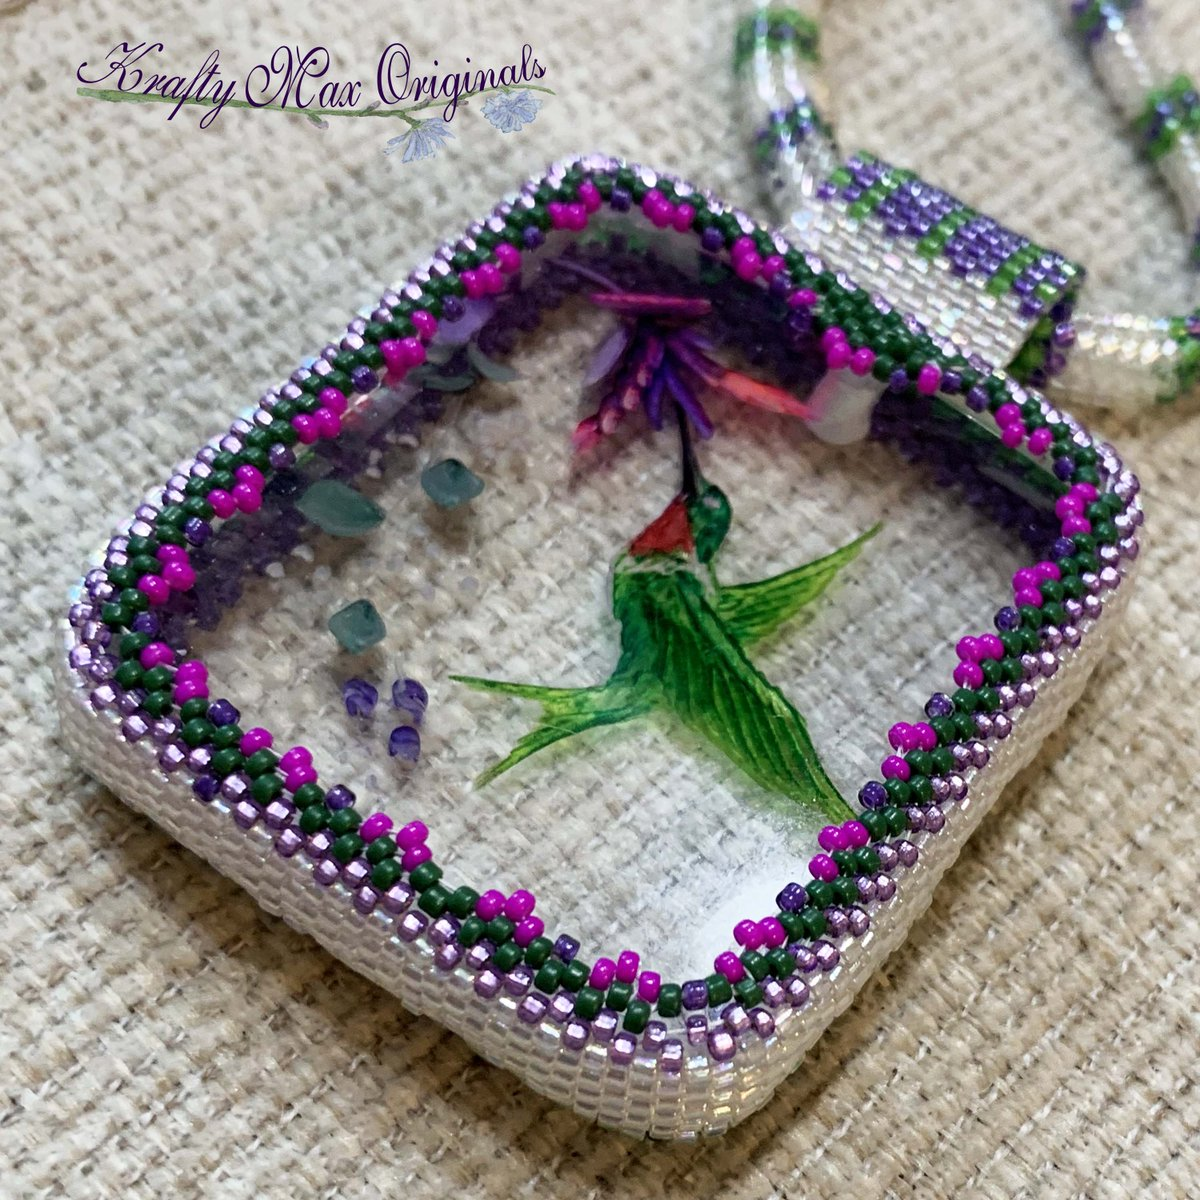 Ruby-throated Hummingbird Beadwoven Wearable Art Necklace $110  #beadwoven #wearableart #art #offloom #original #handmade #buyhandmade #handmadelove #handcrafted #kraftymax #kmax #peyote #herringbone #bezel #necklace